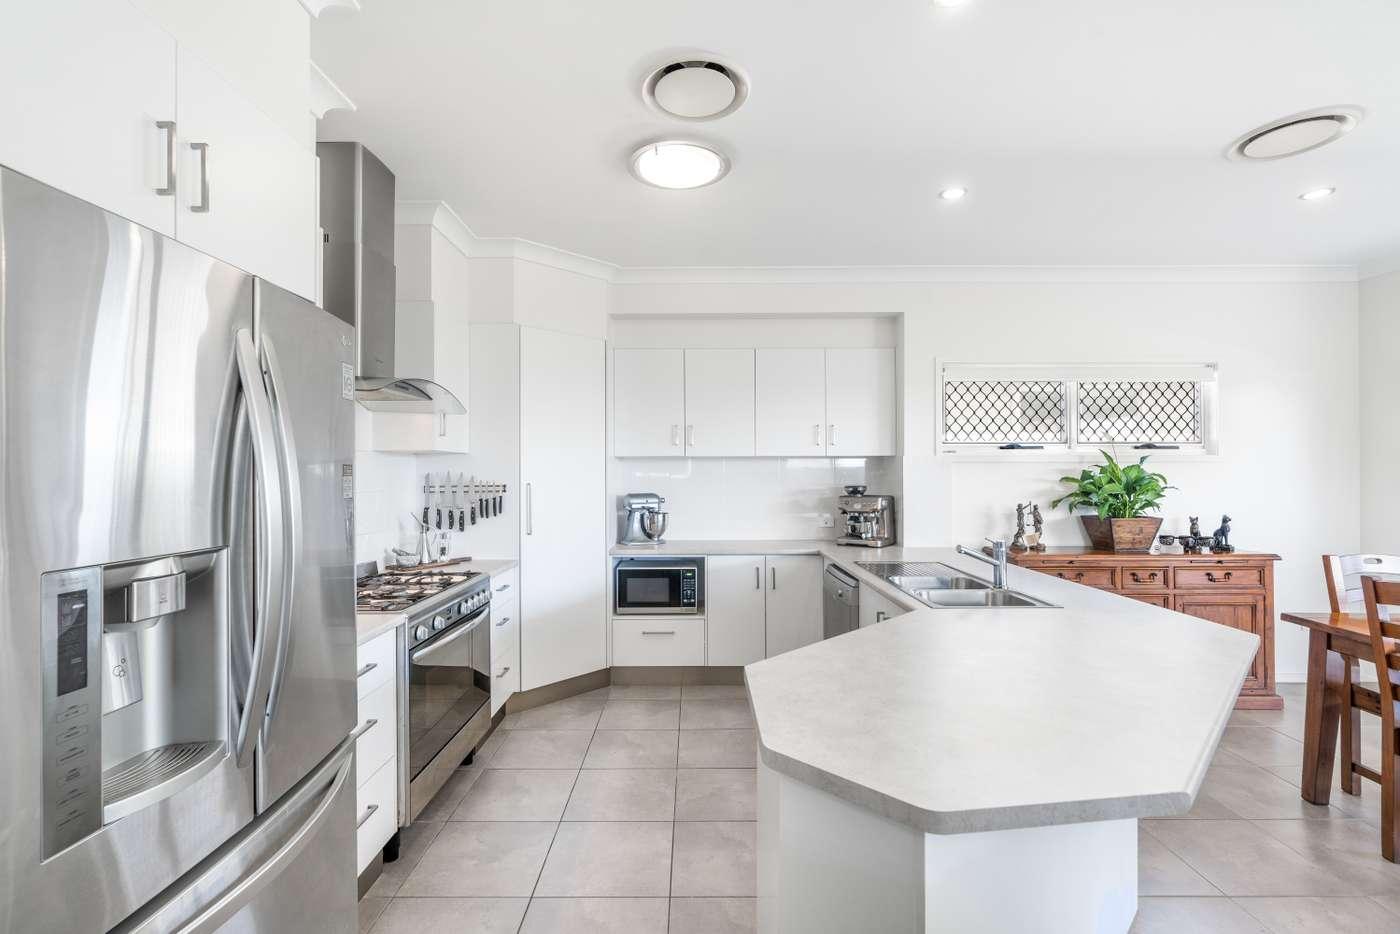 Sixth view of Homely house listing, 77 Drayton Terrace, Wynnum QLD 4178